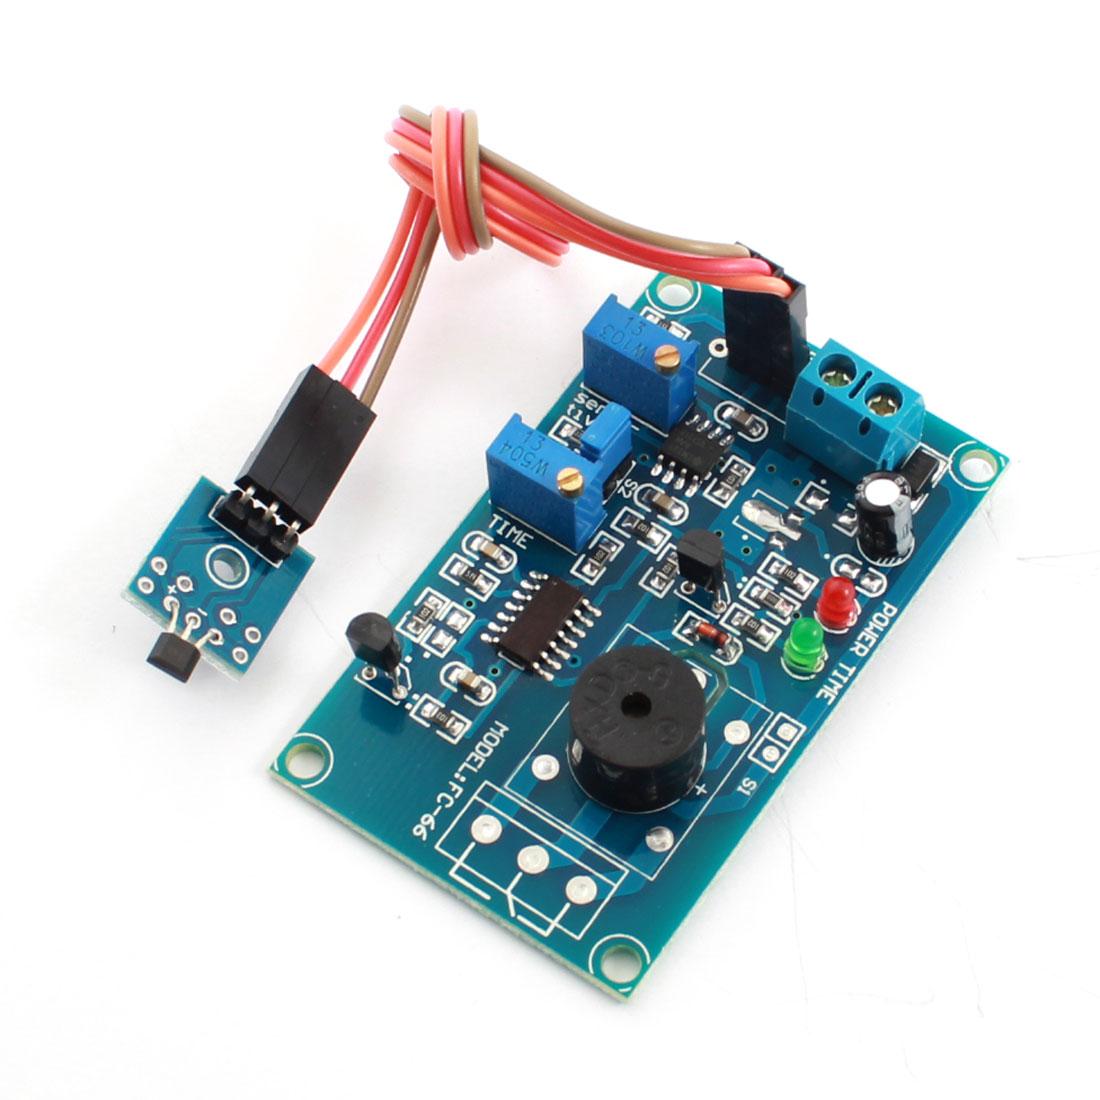 FC-66 DC5V Hall Effect Sensor No Magnetic Trigger Delay PCB Circuit Module Green w Piezo Buzzer